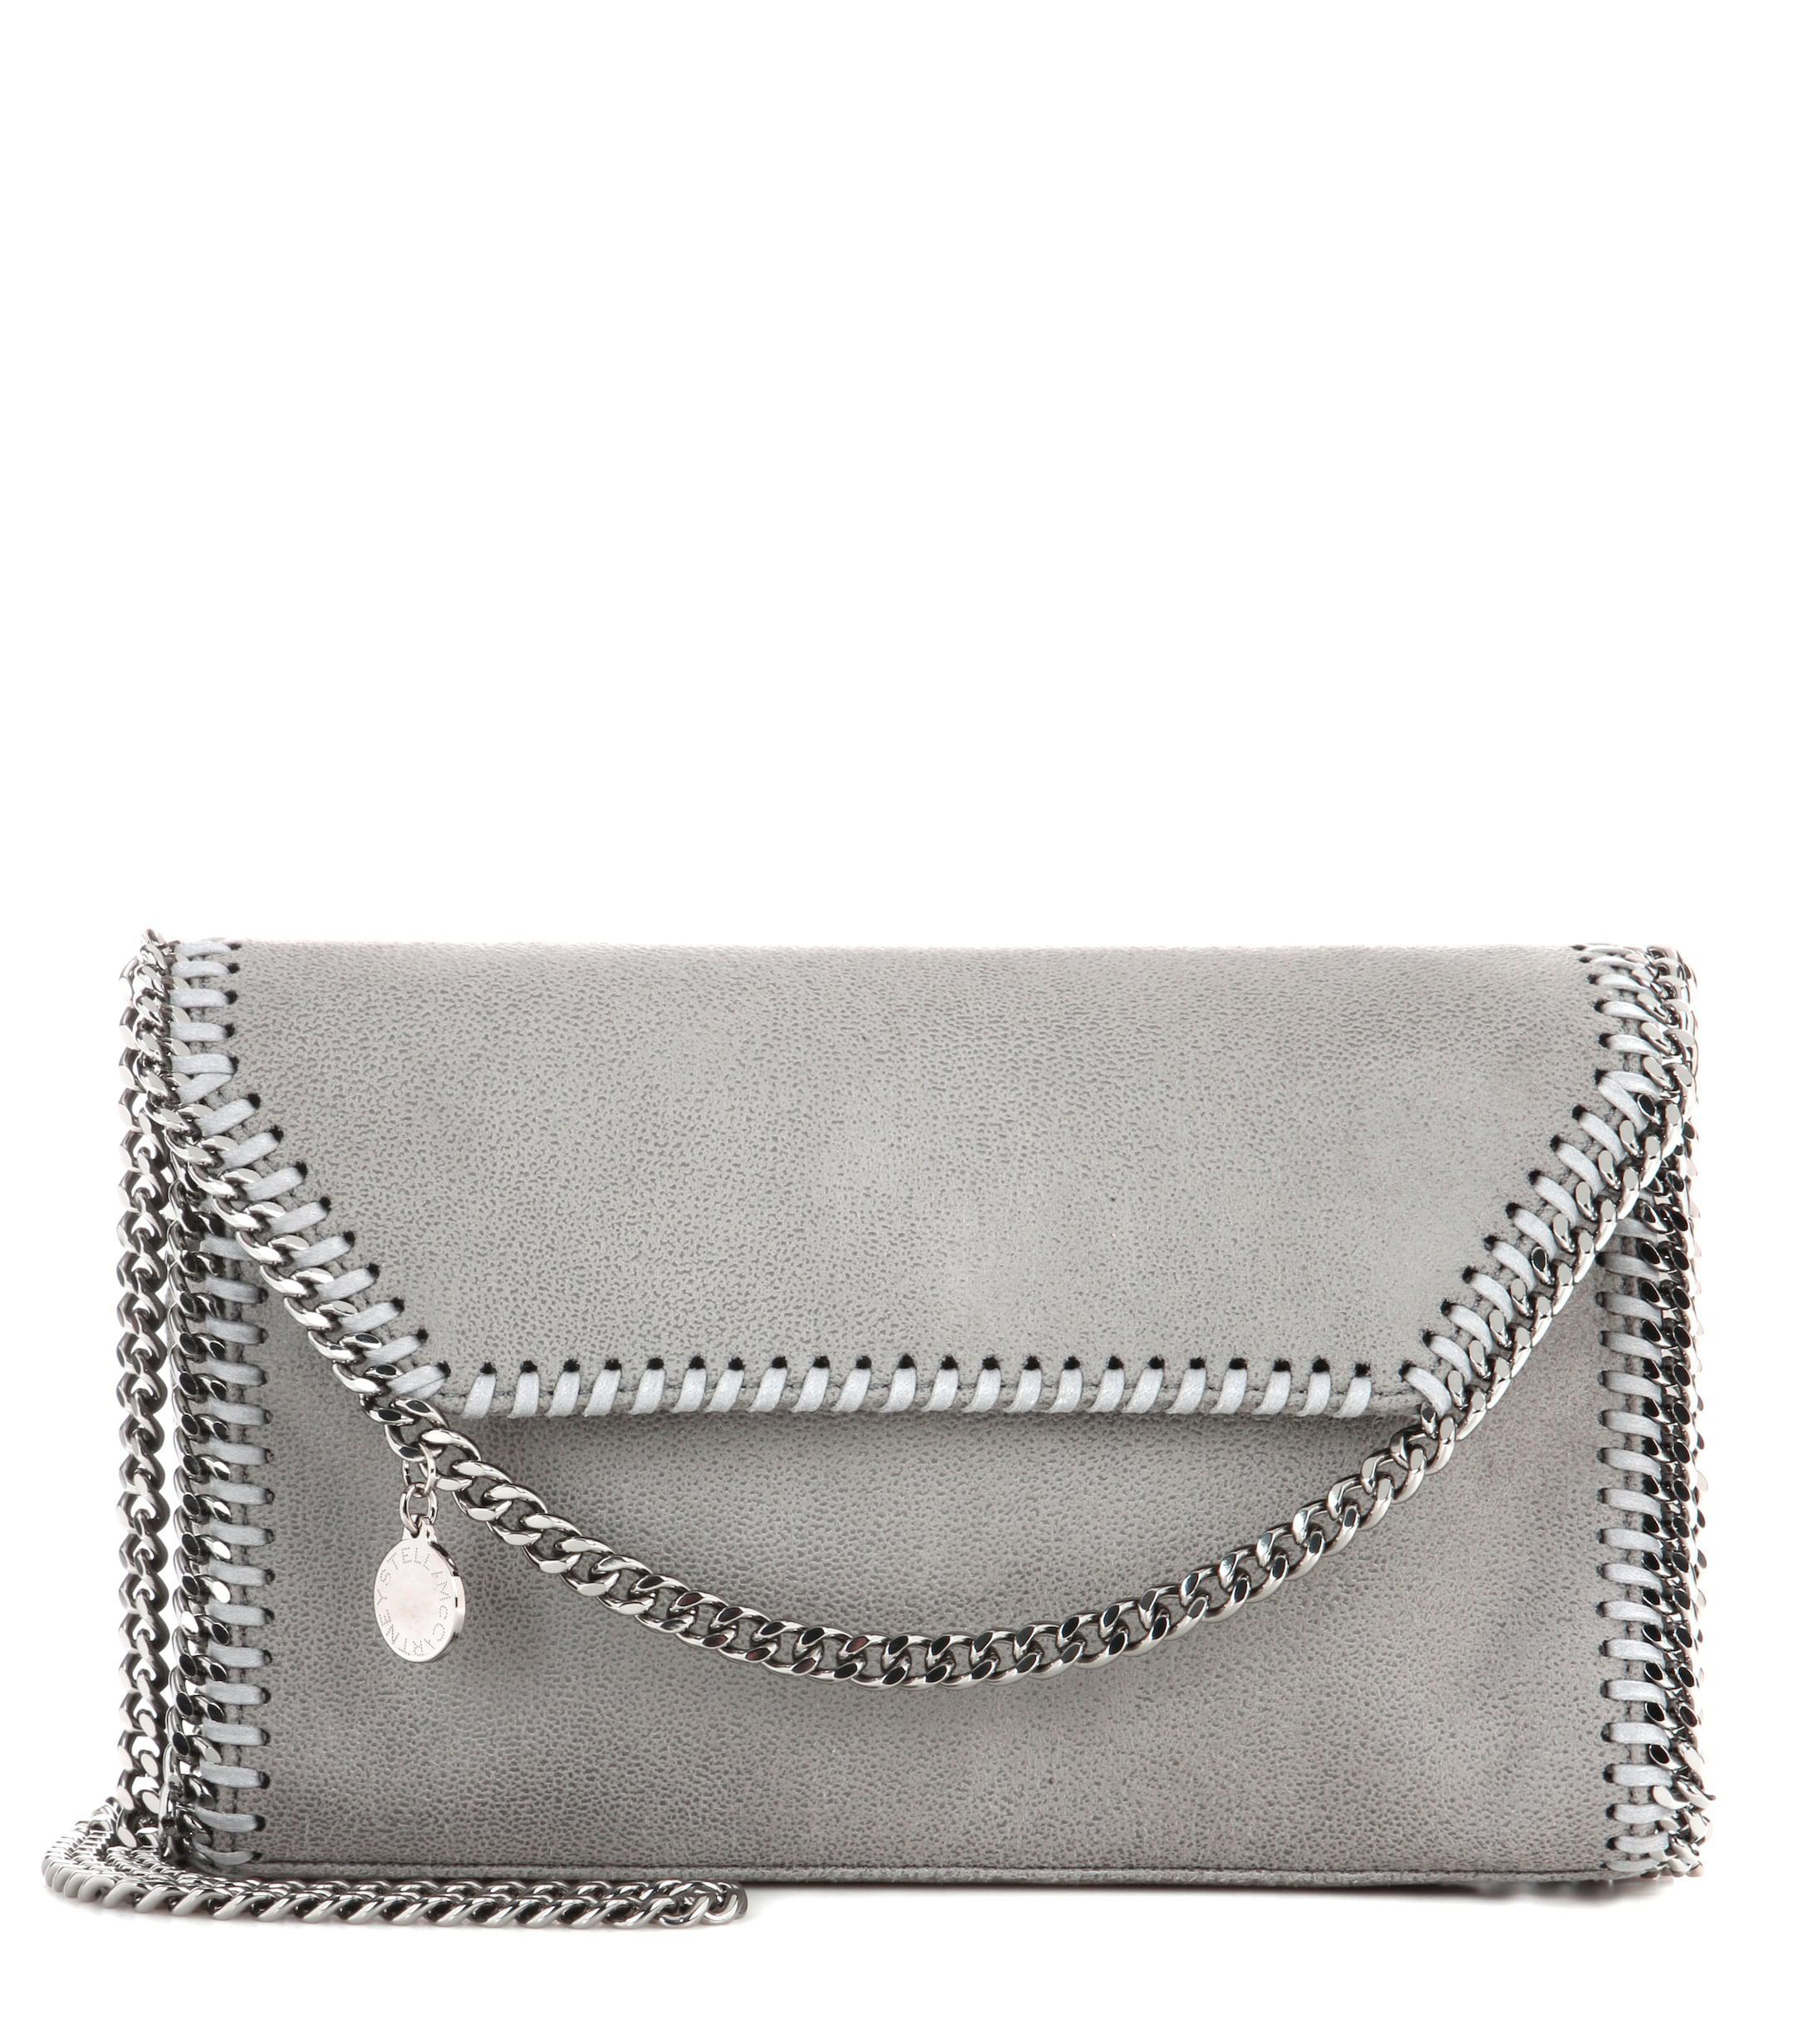 62fe9ce4d3 Lyst - Stella McCartney Falabella Shaggy Deer Shoulder Bag in Gray